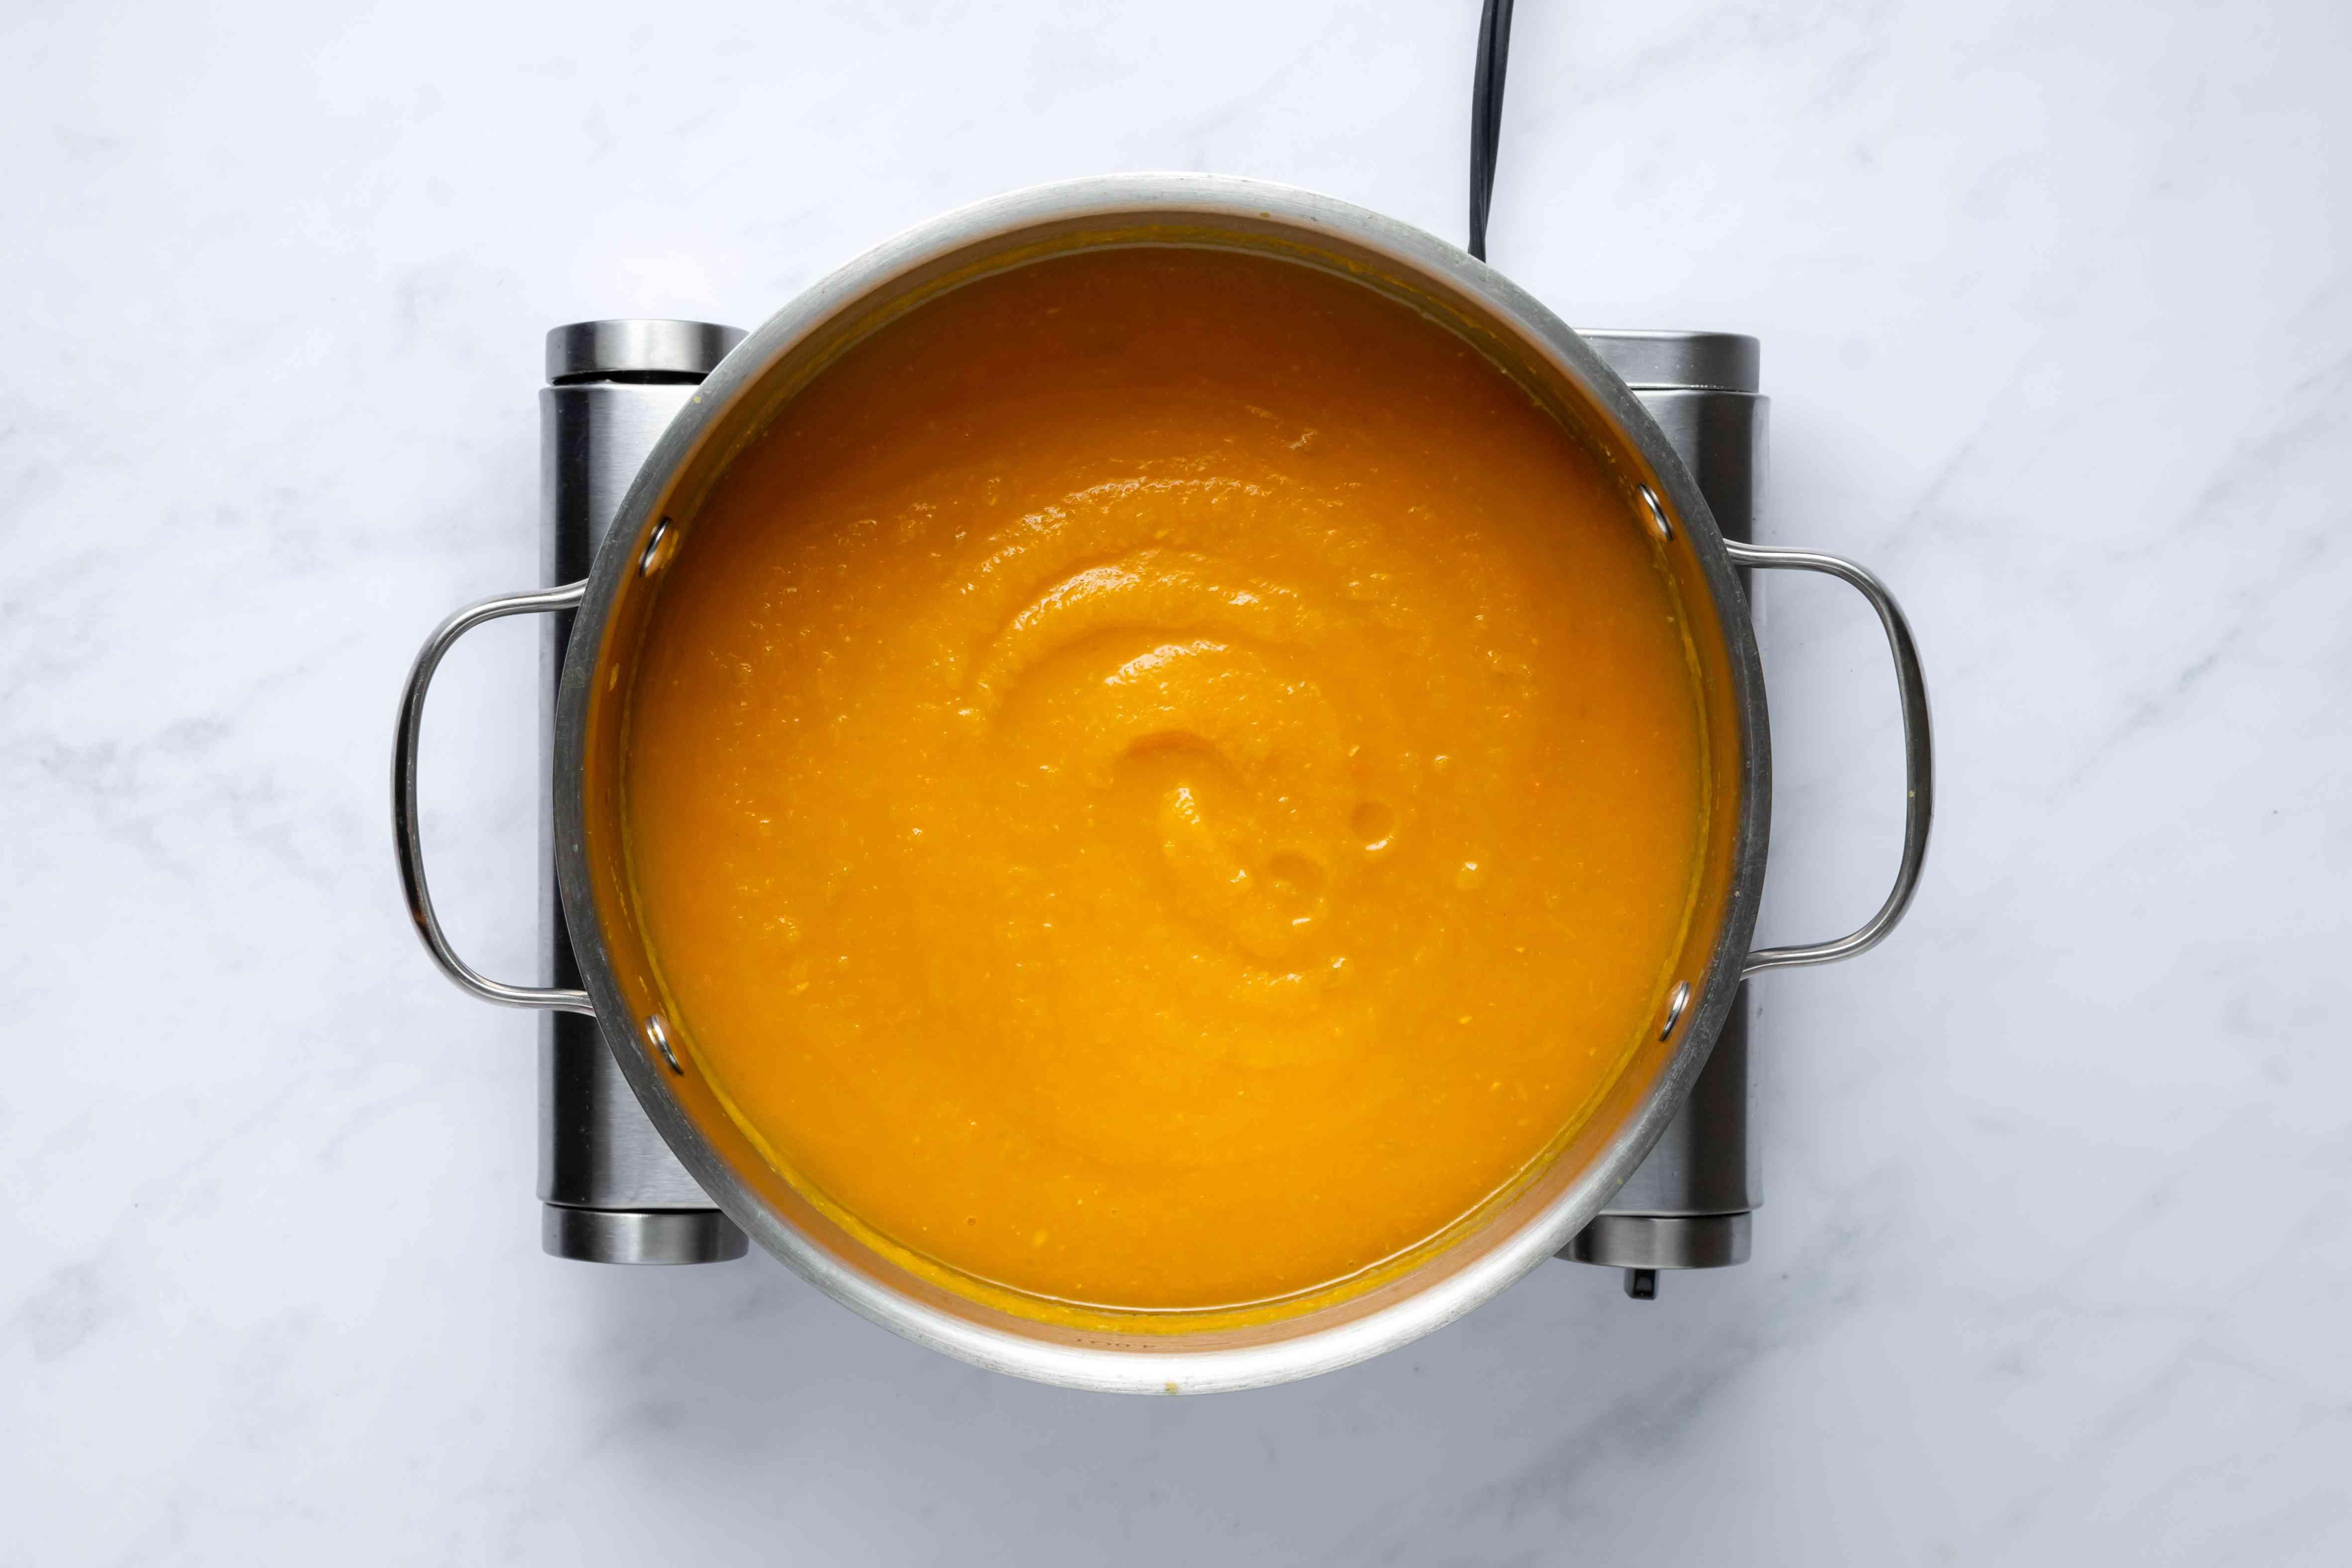 blended butternut squash soup in a pot